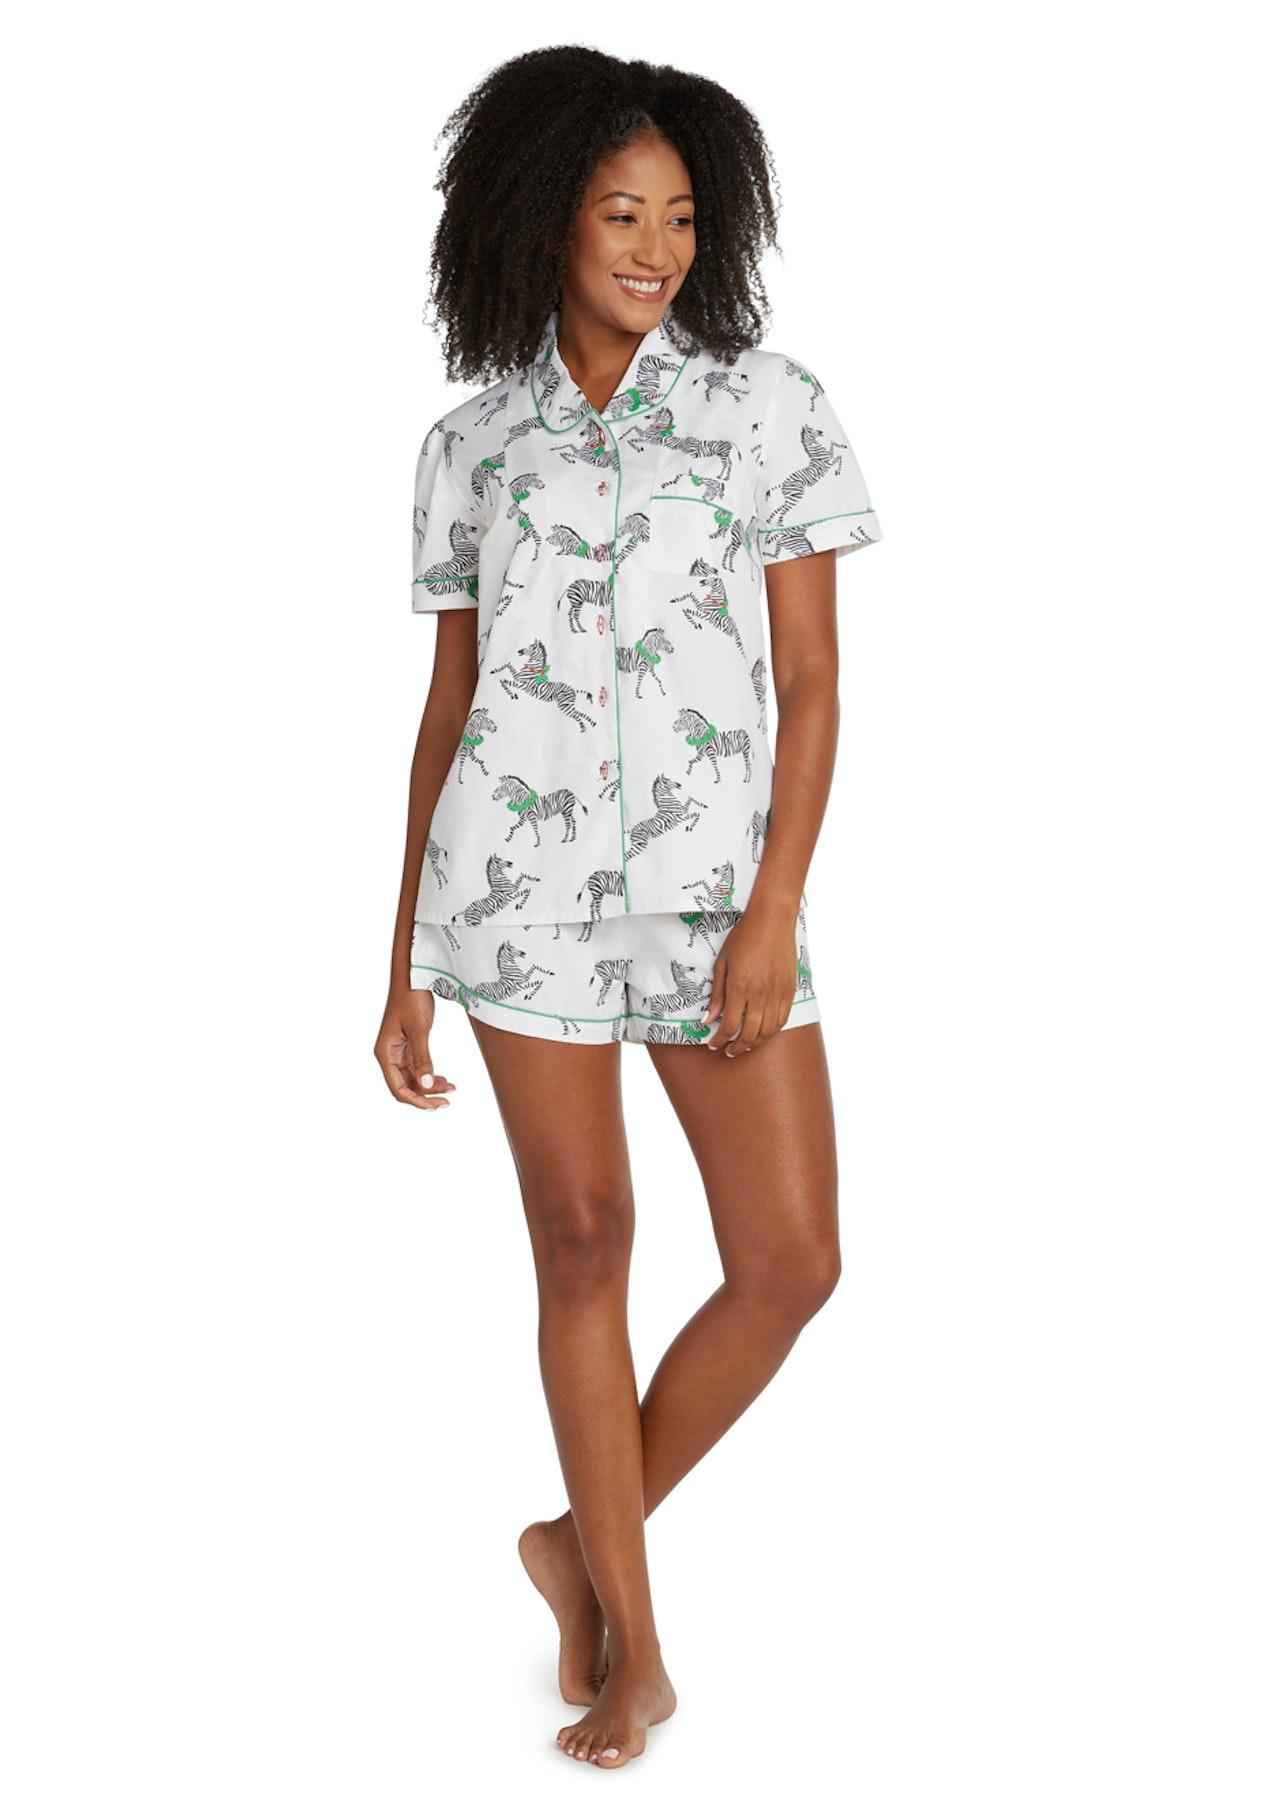 720dc656b0 Sant & Abel - Women - Long Sleeve Shirt & PJ Pant Set - Zebra - Luxury  Sleepwear - Onceit